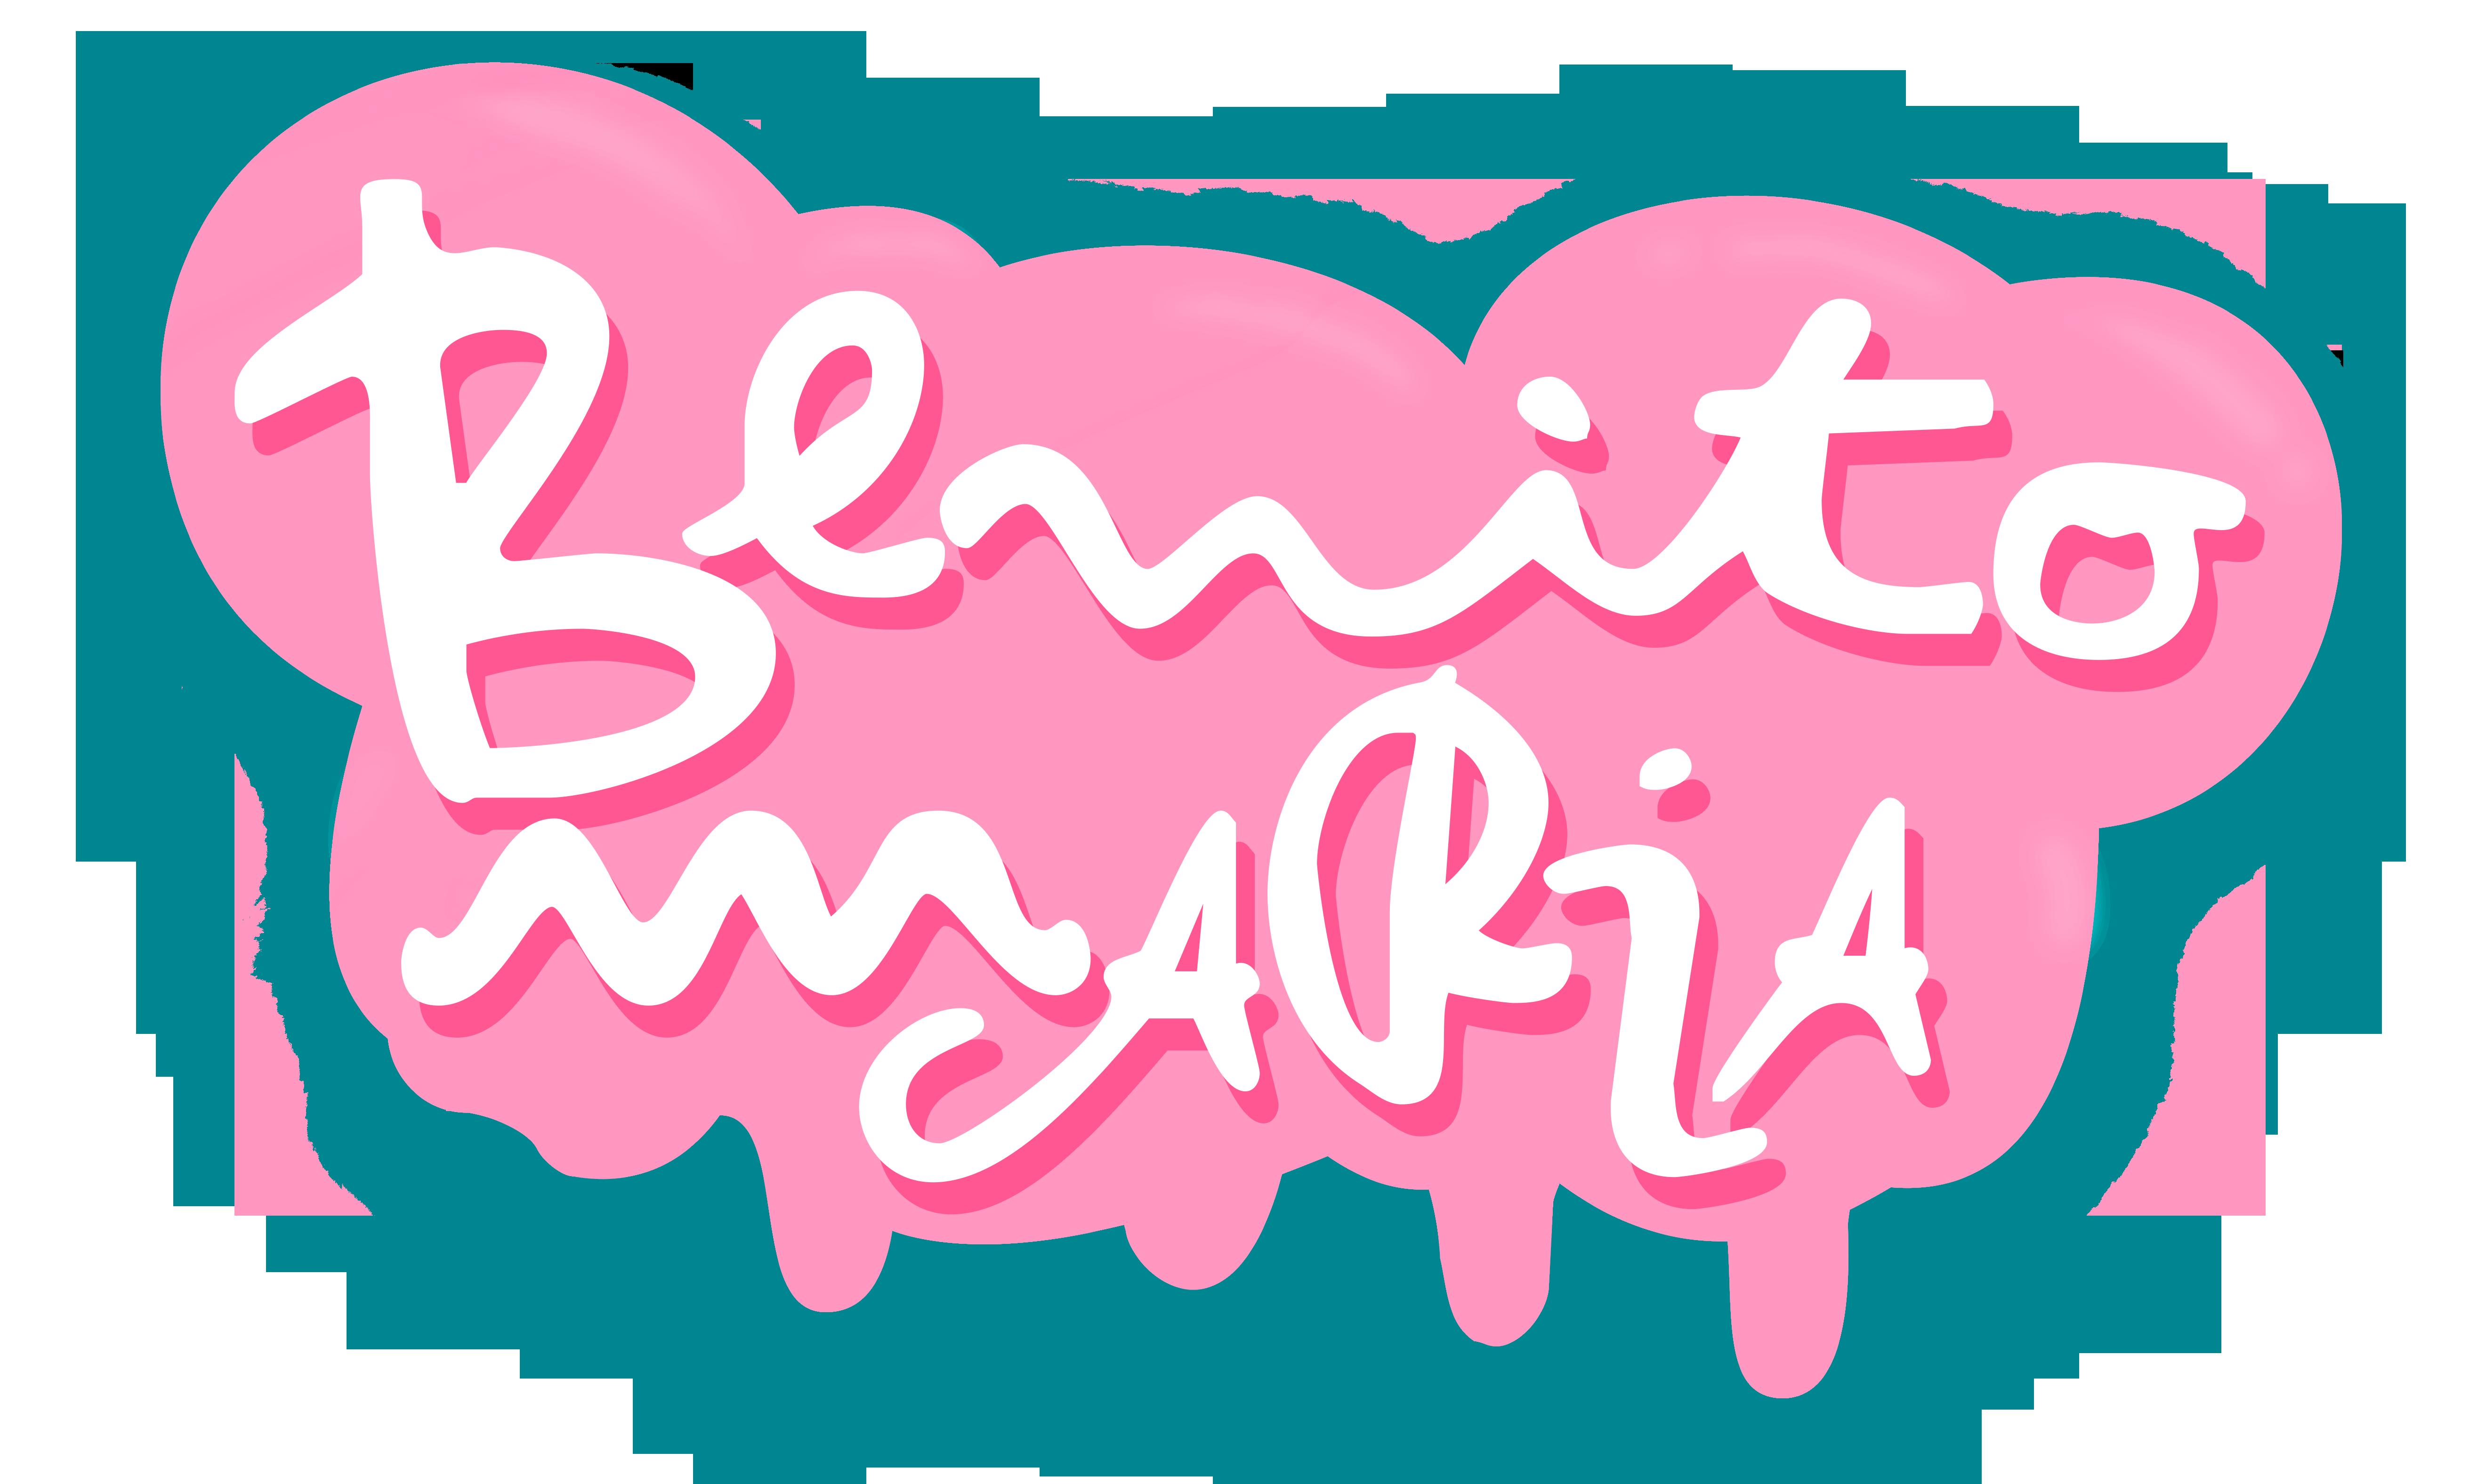 LOGO_BENITO_MARIA